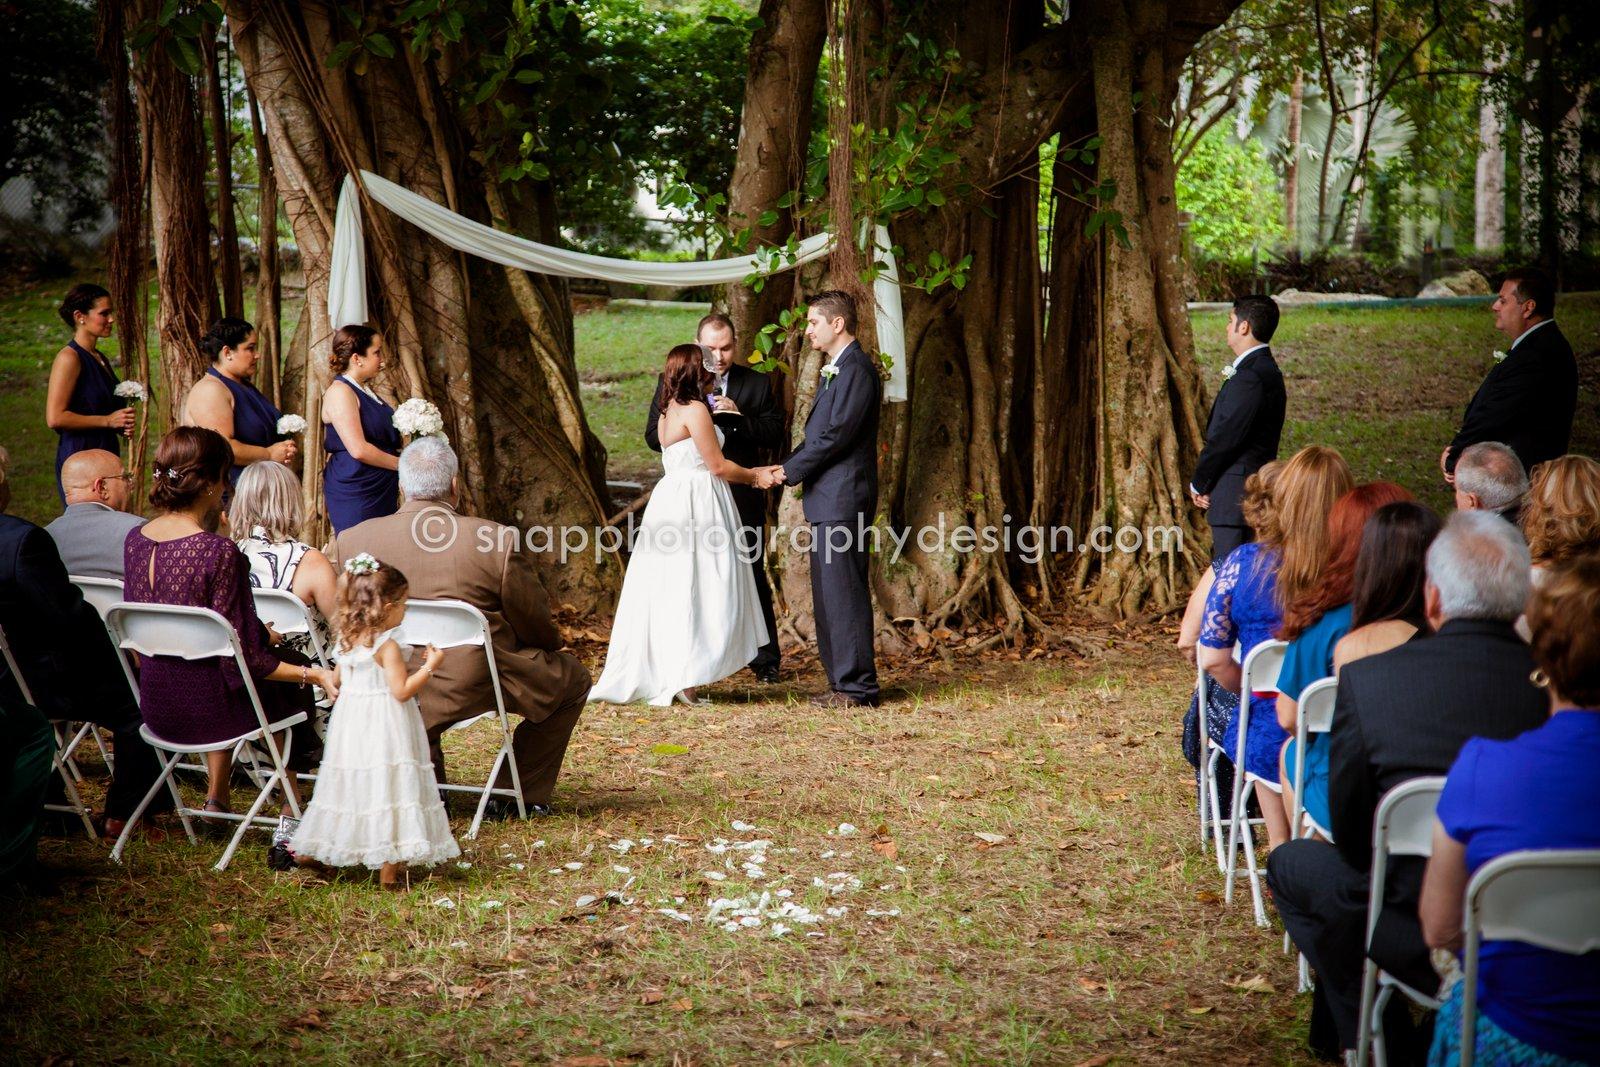 Snap Photography & Design's Blog: Jennifer + Gabriel tie the knot ...